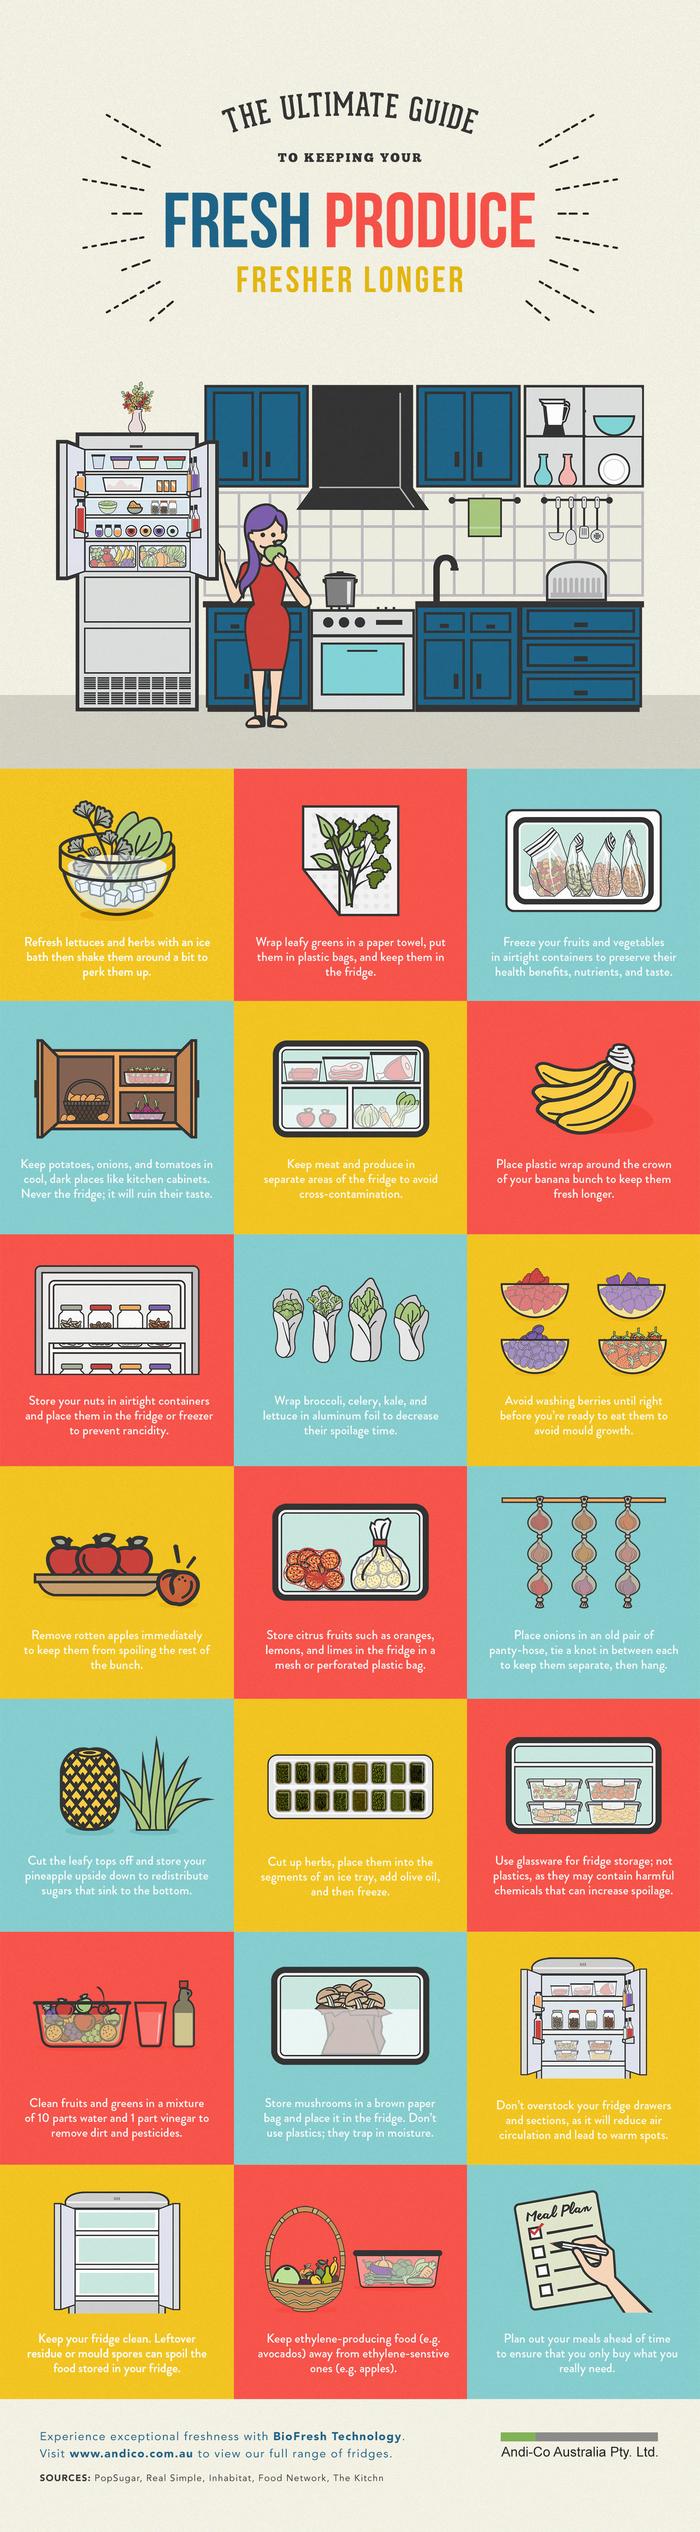 storing fresh produce infographic